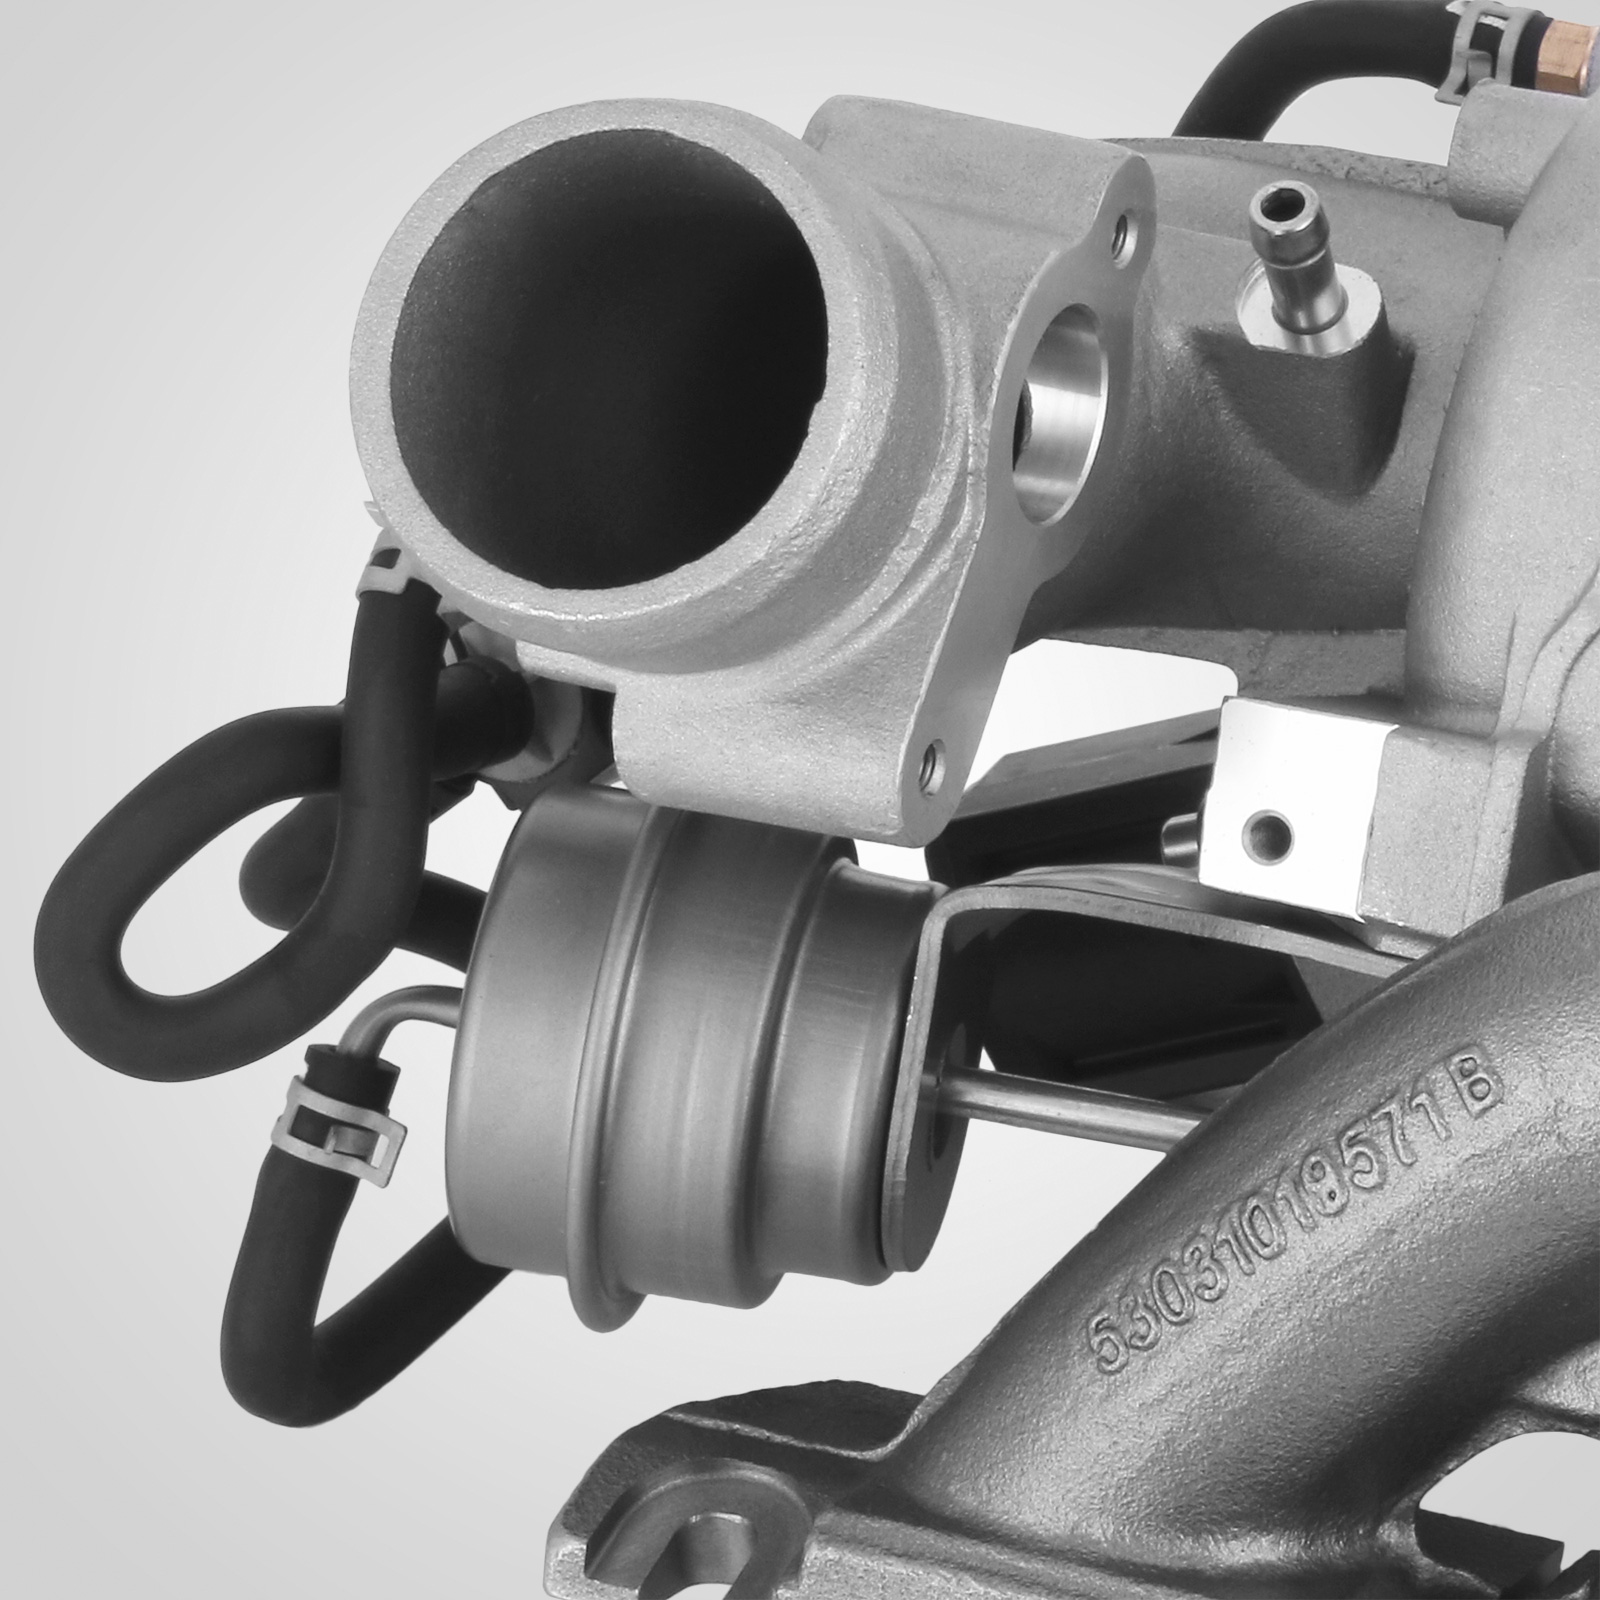 2007 Audi A4 Turbo Problems: New K03 Turbo Turbocharger For Audi A4 2.0T B7 BUL BWE BWT